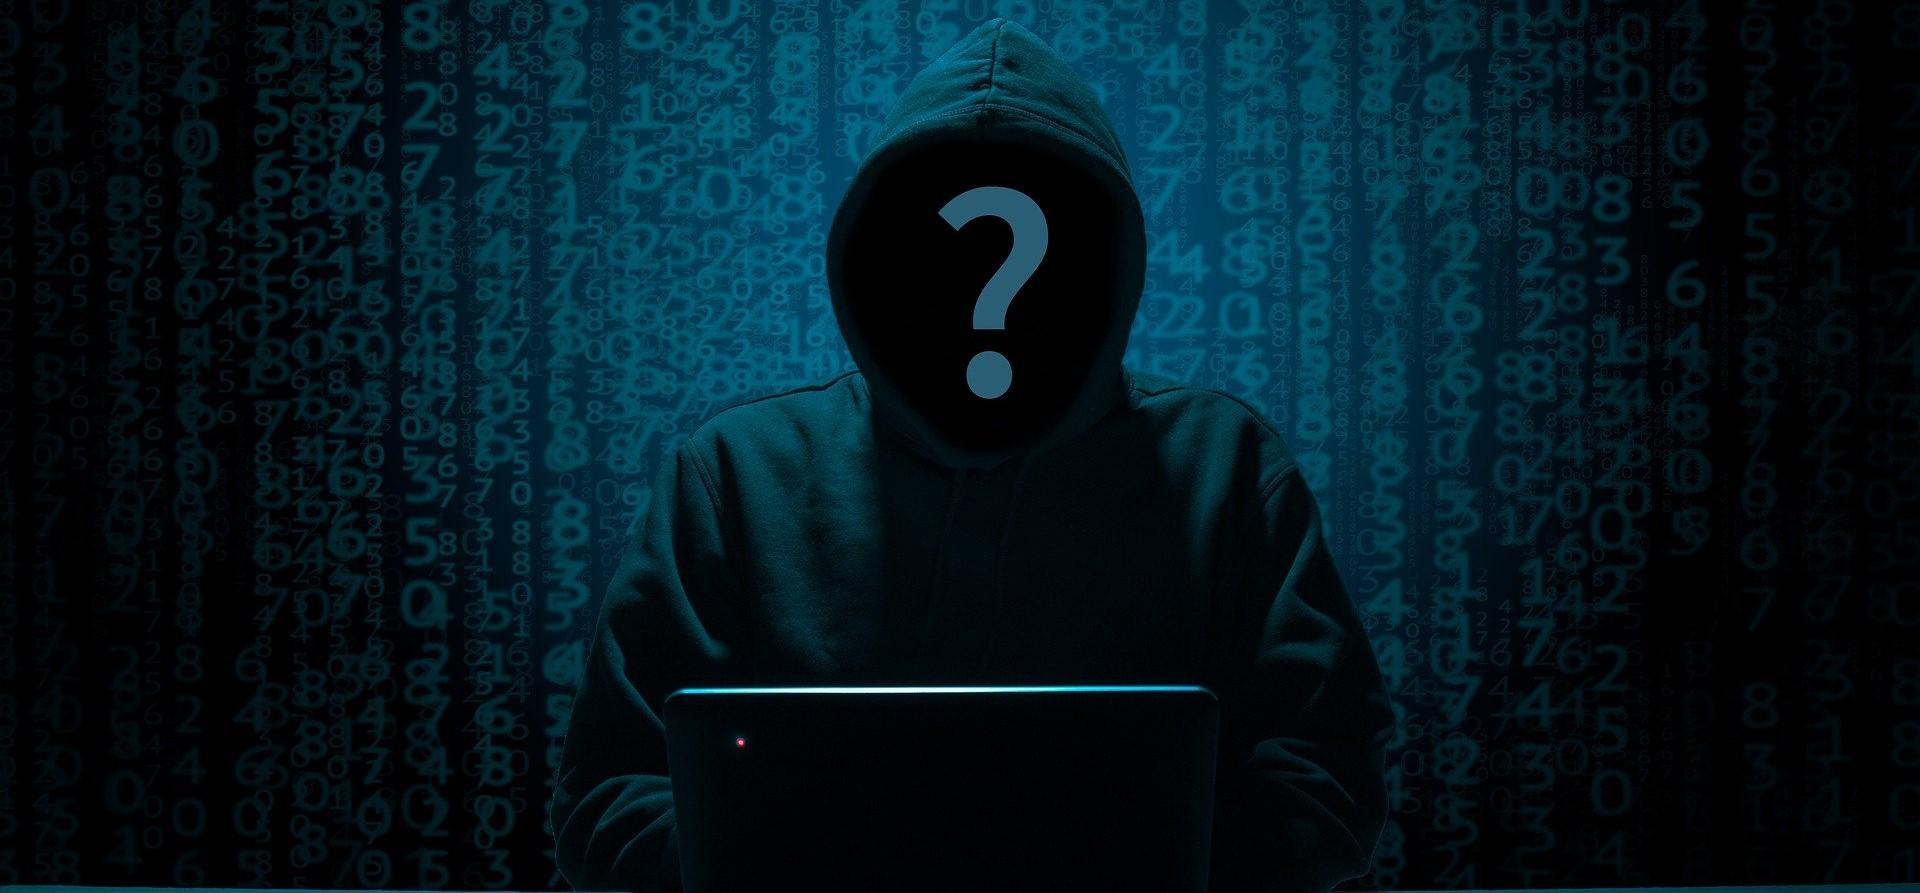 hacker is dealing with cyber risk